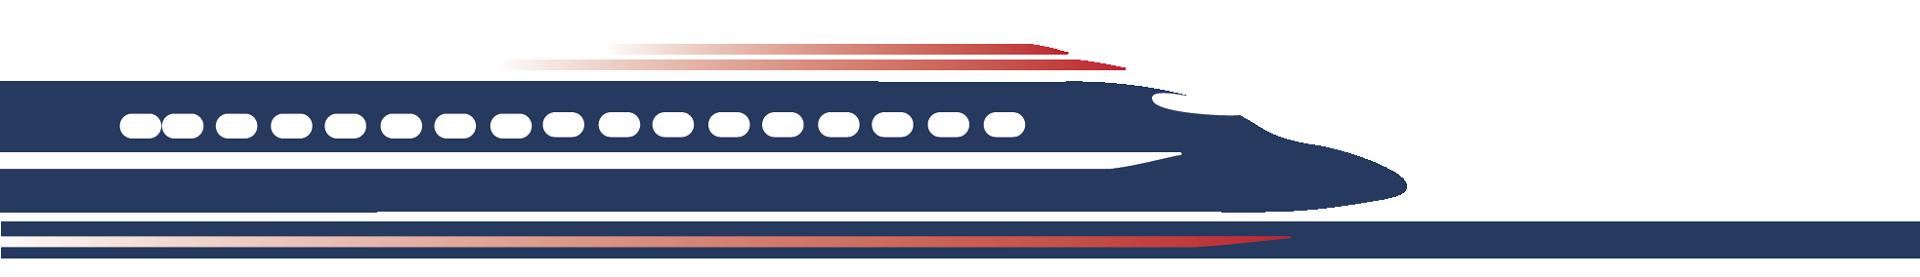 Economic impact texas central. Driving clipart train operator